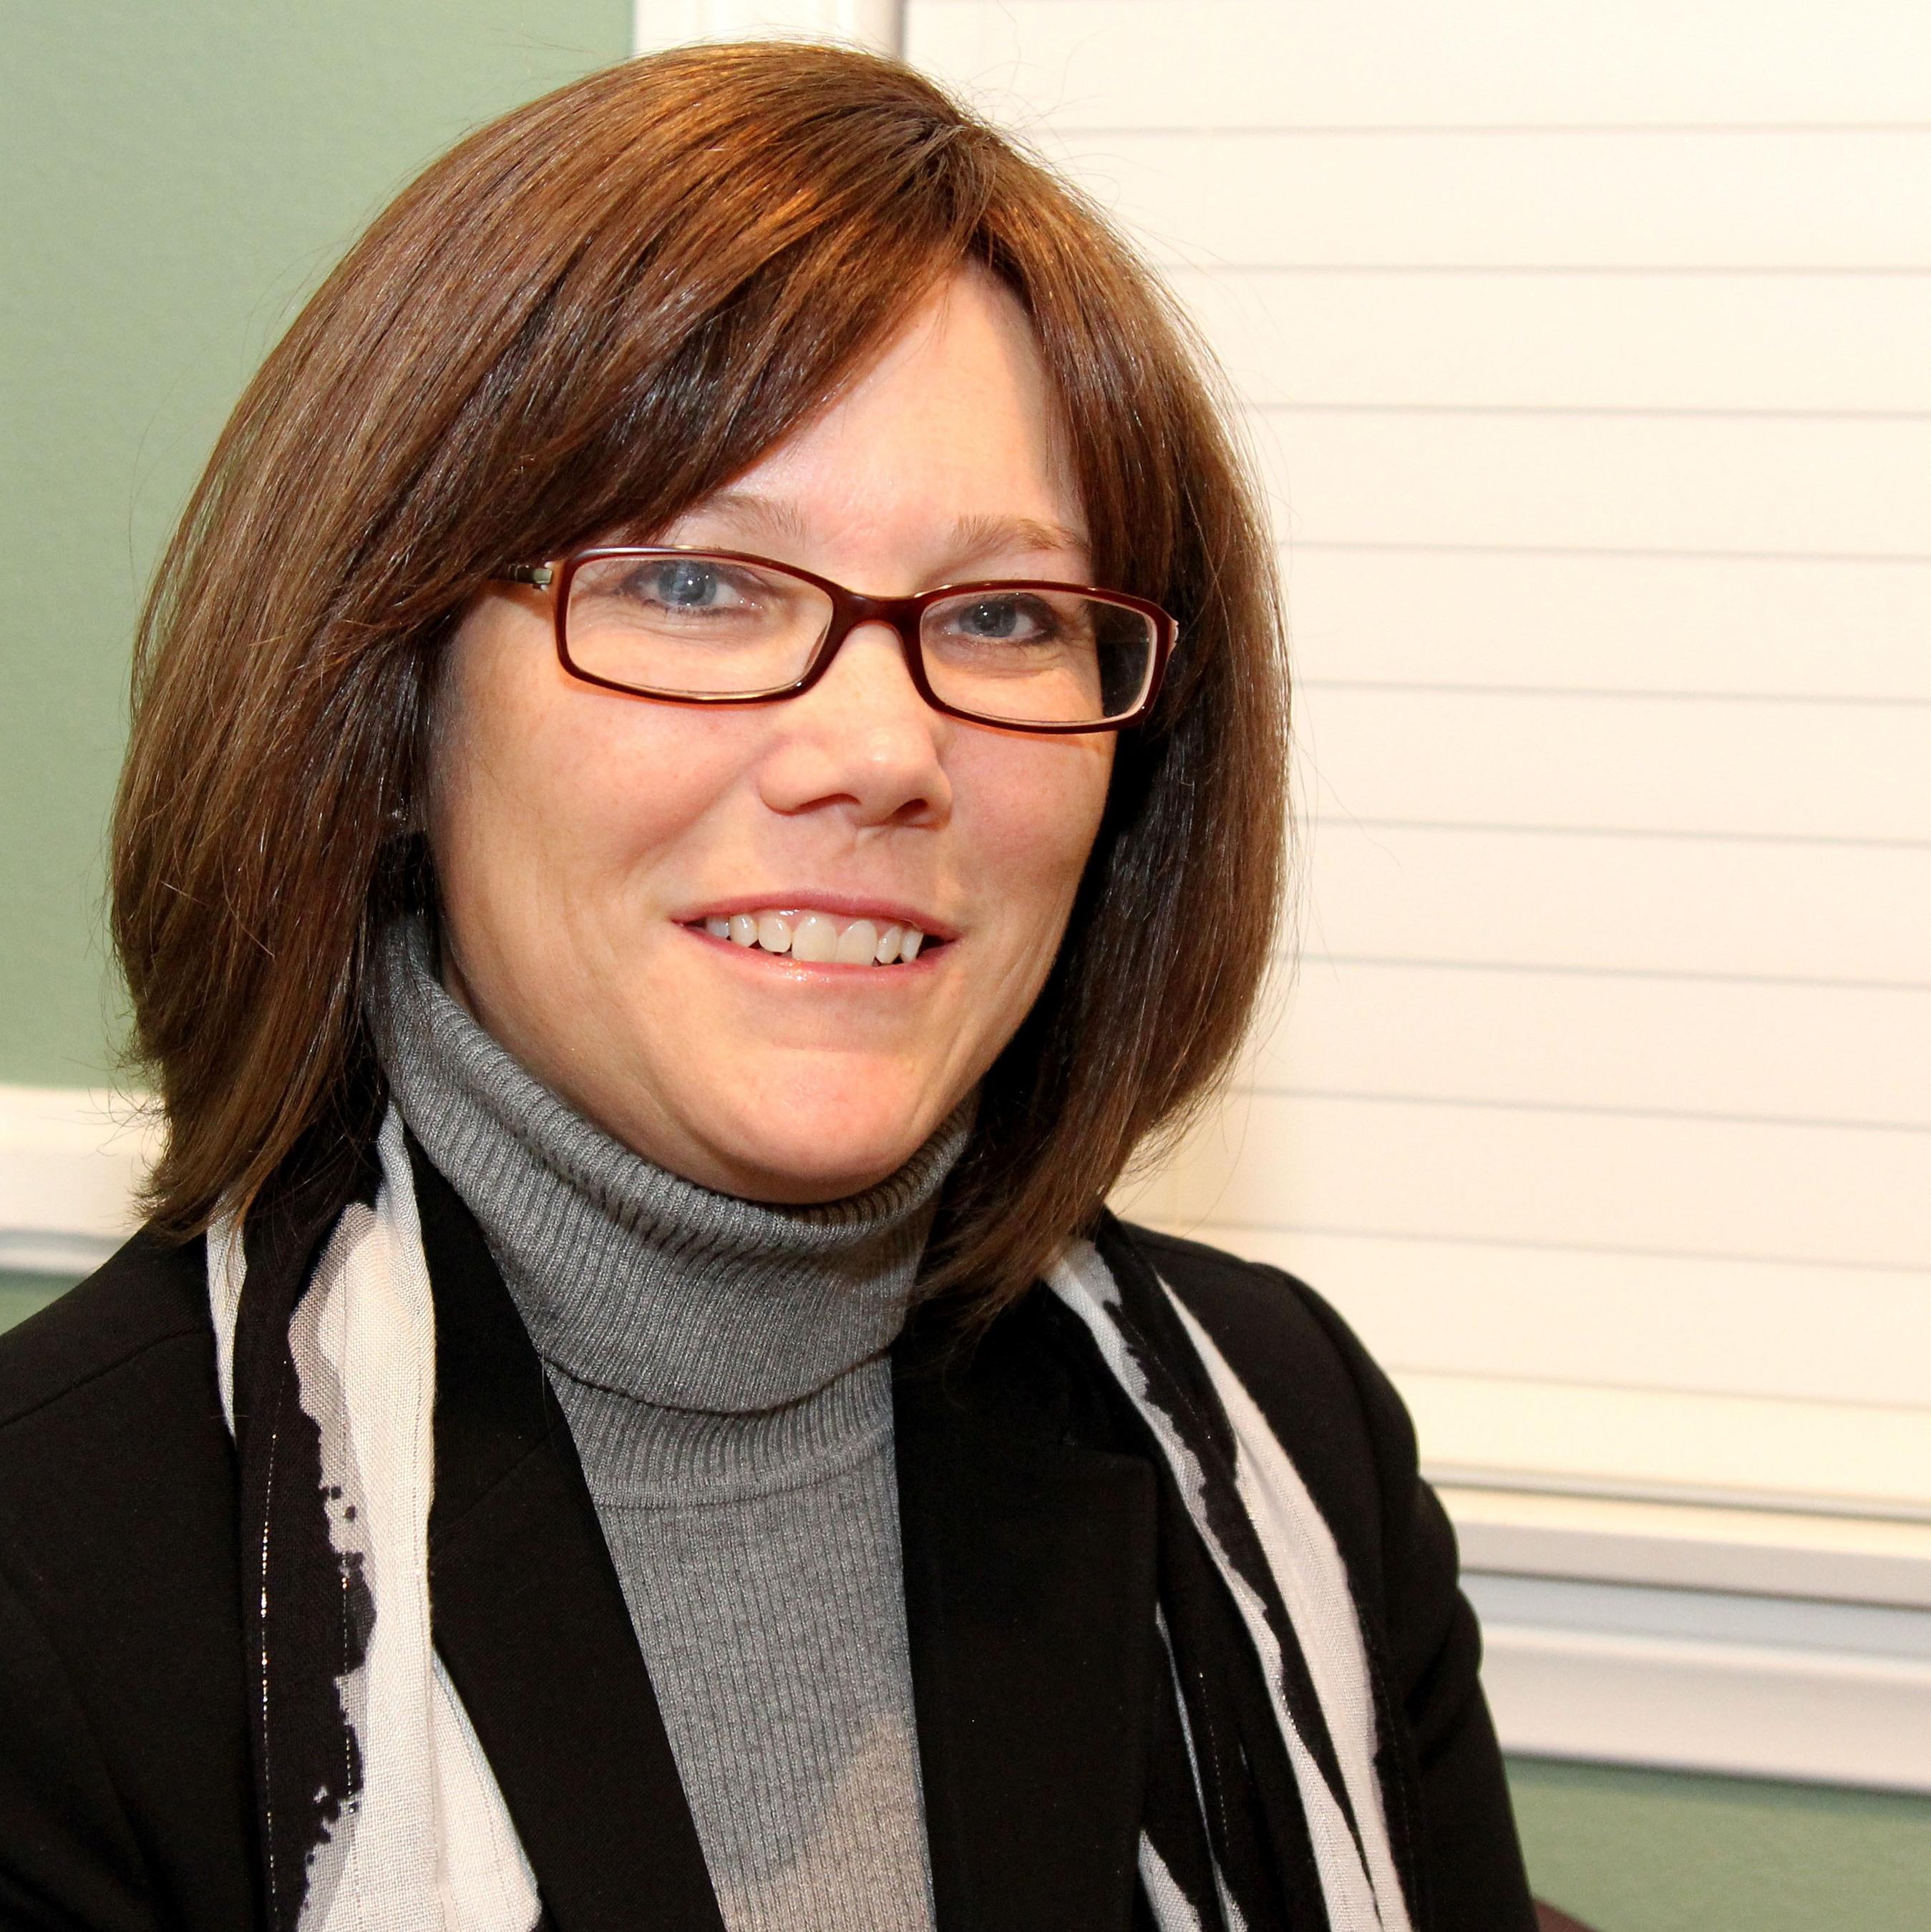 Lisa Anderson. (PRNewsFoto/LMA Consulting Group) (PRNewsFoto/LMA CONSULTING GROUP)